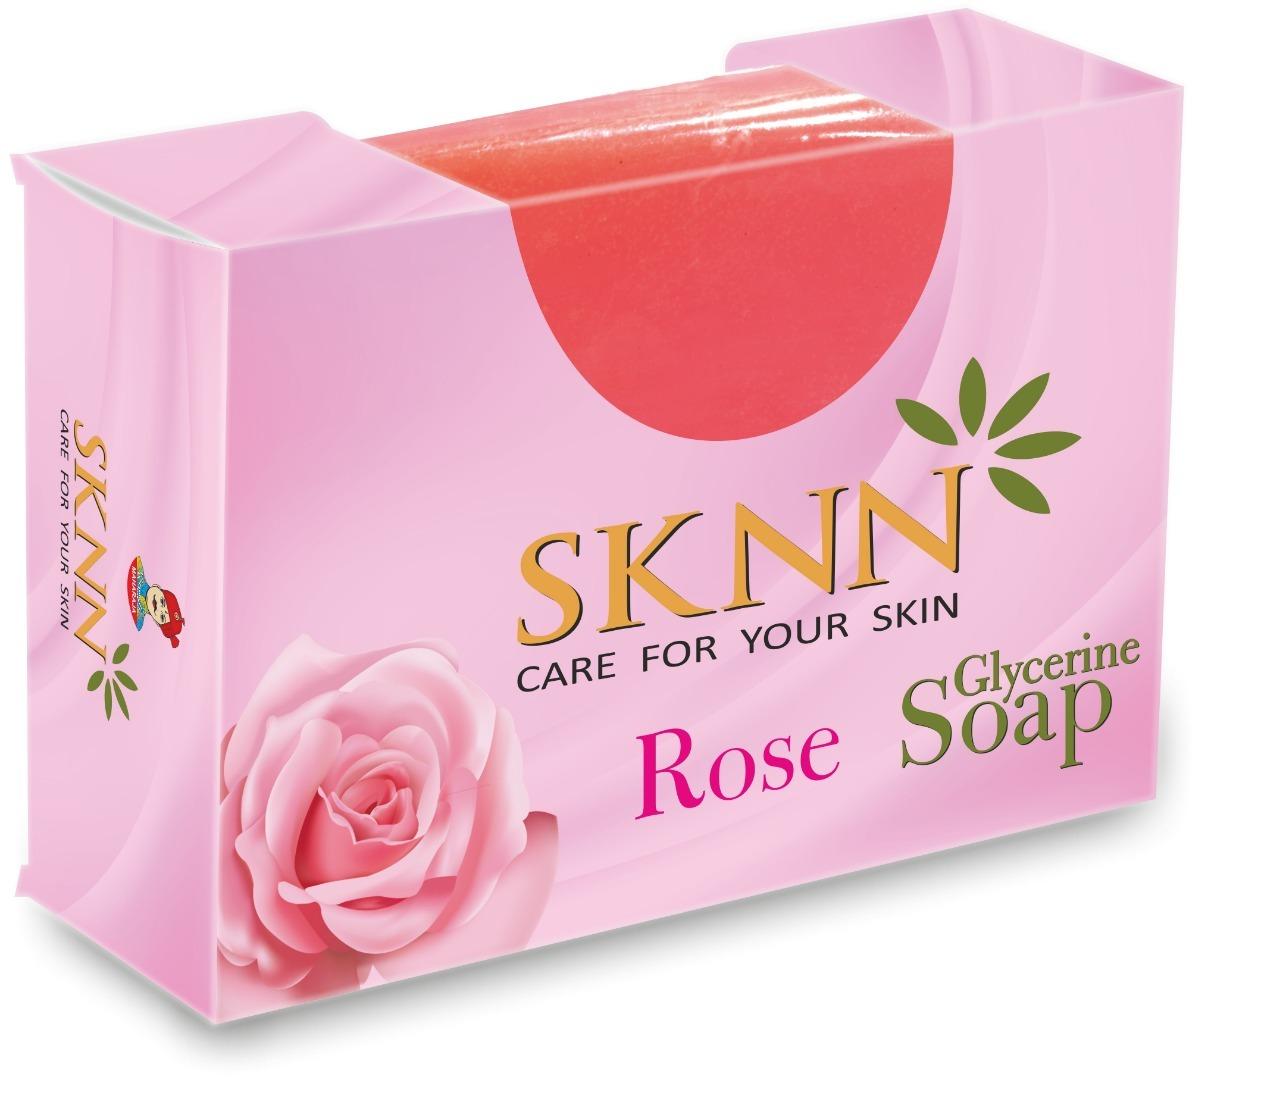 Sknn Rose Glycerine Soap